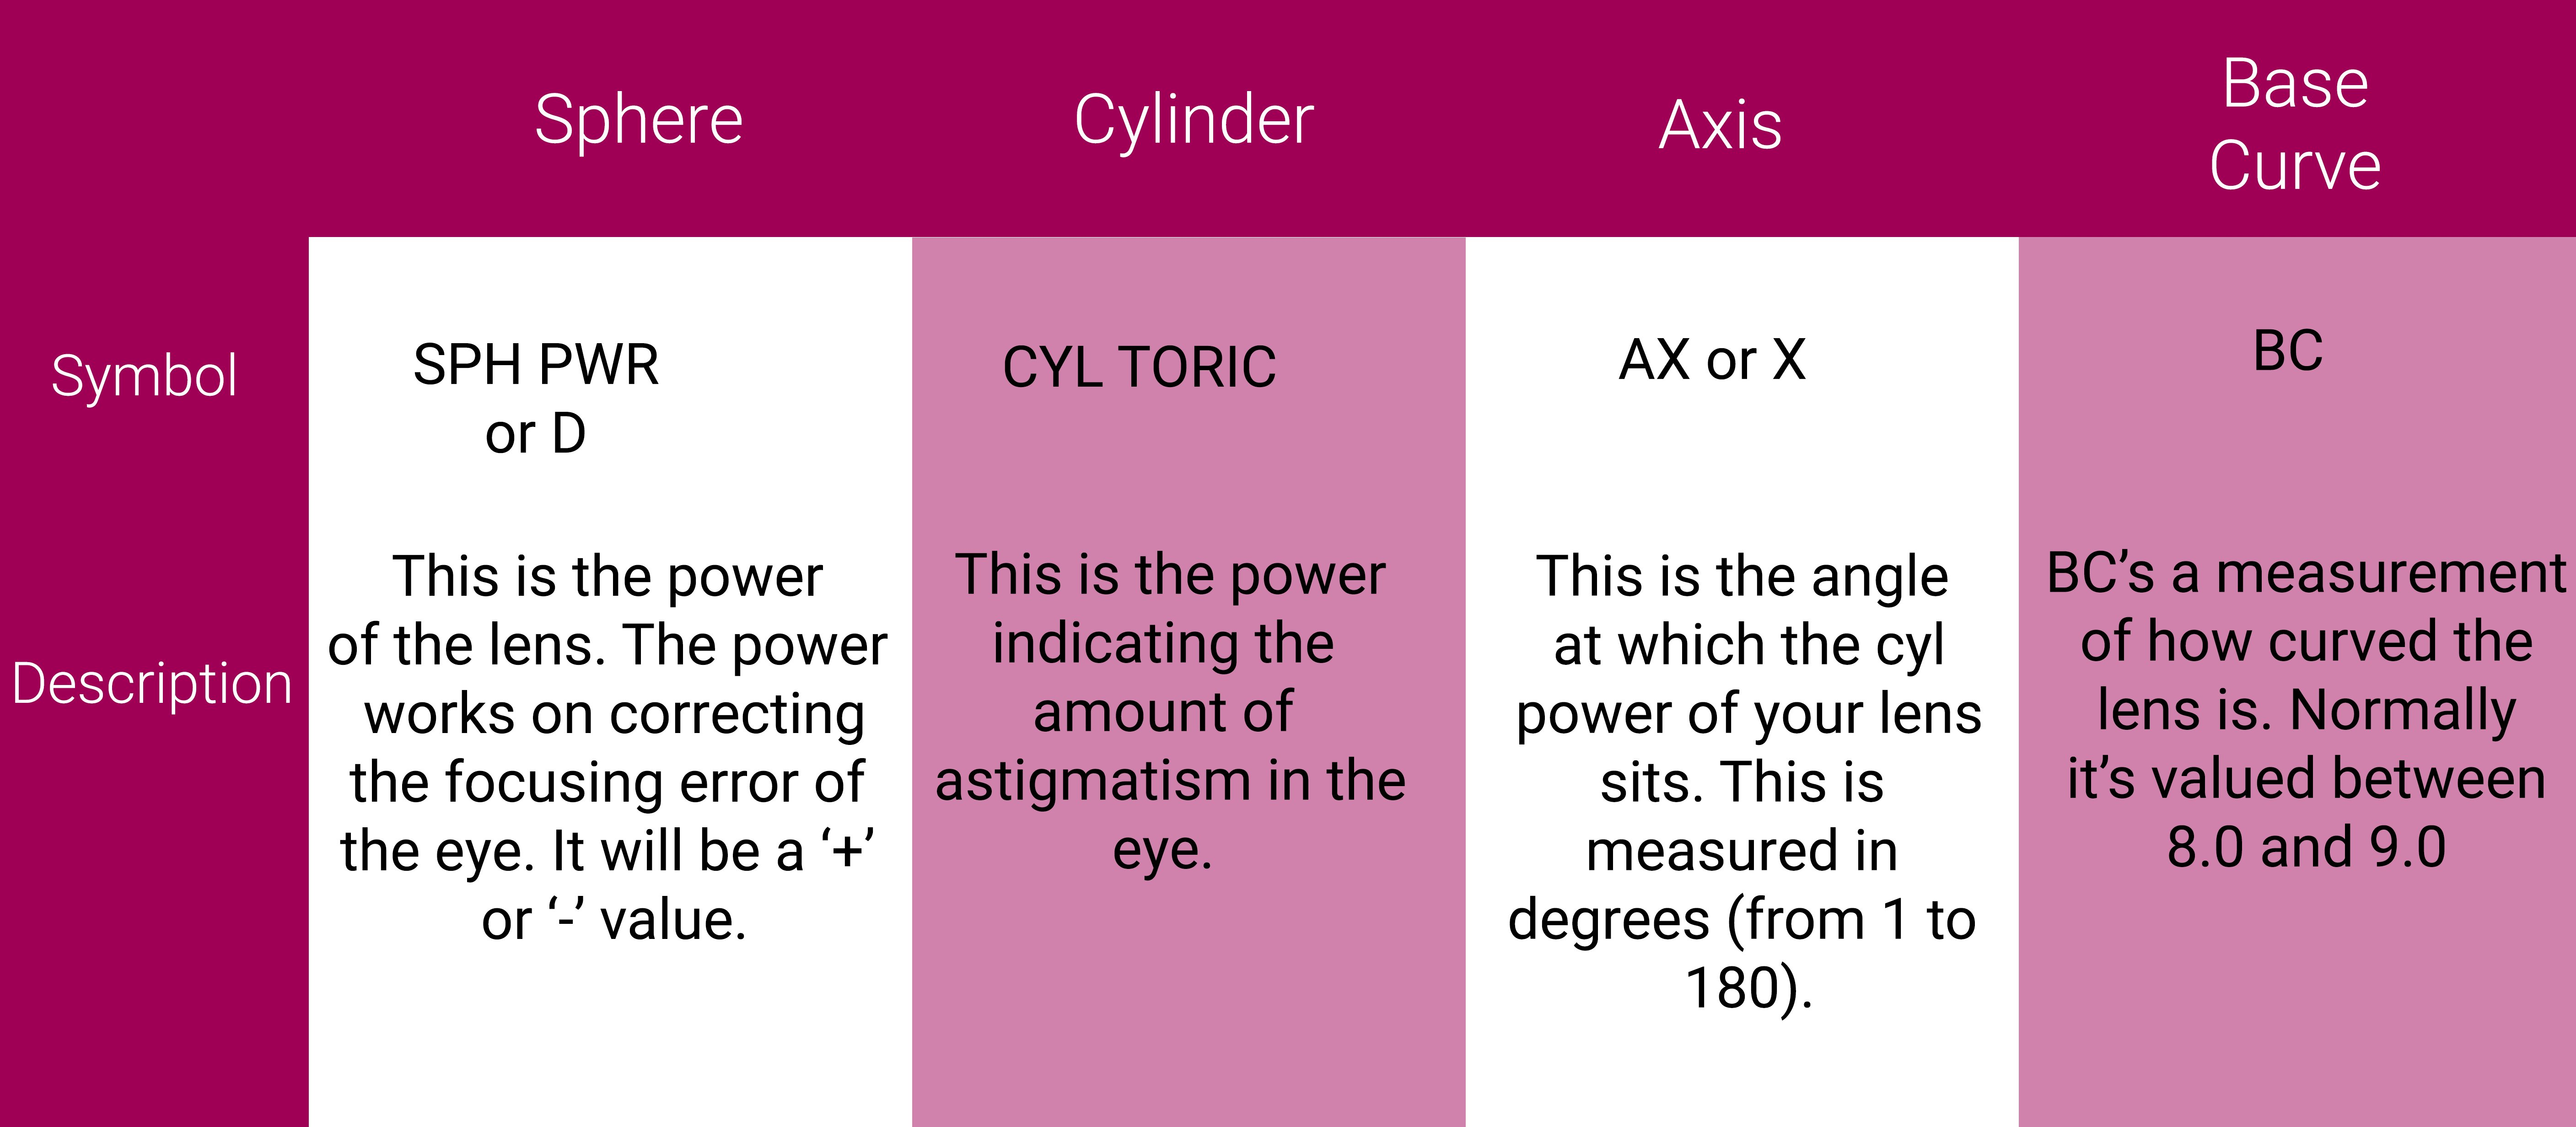 Contact Lense Information